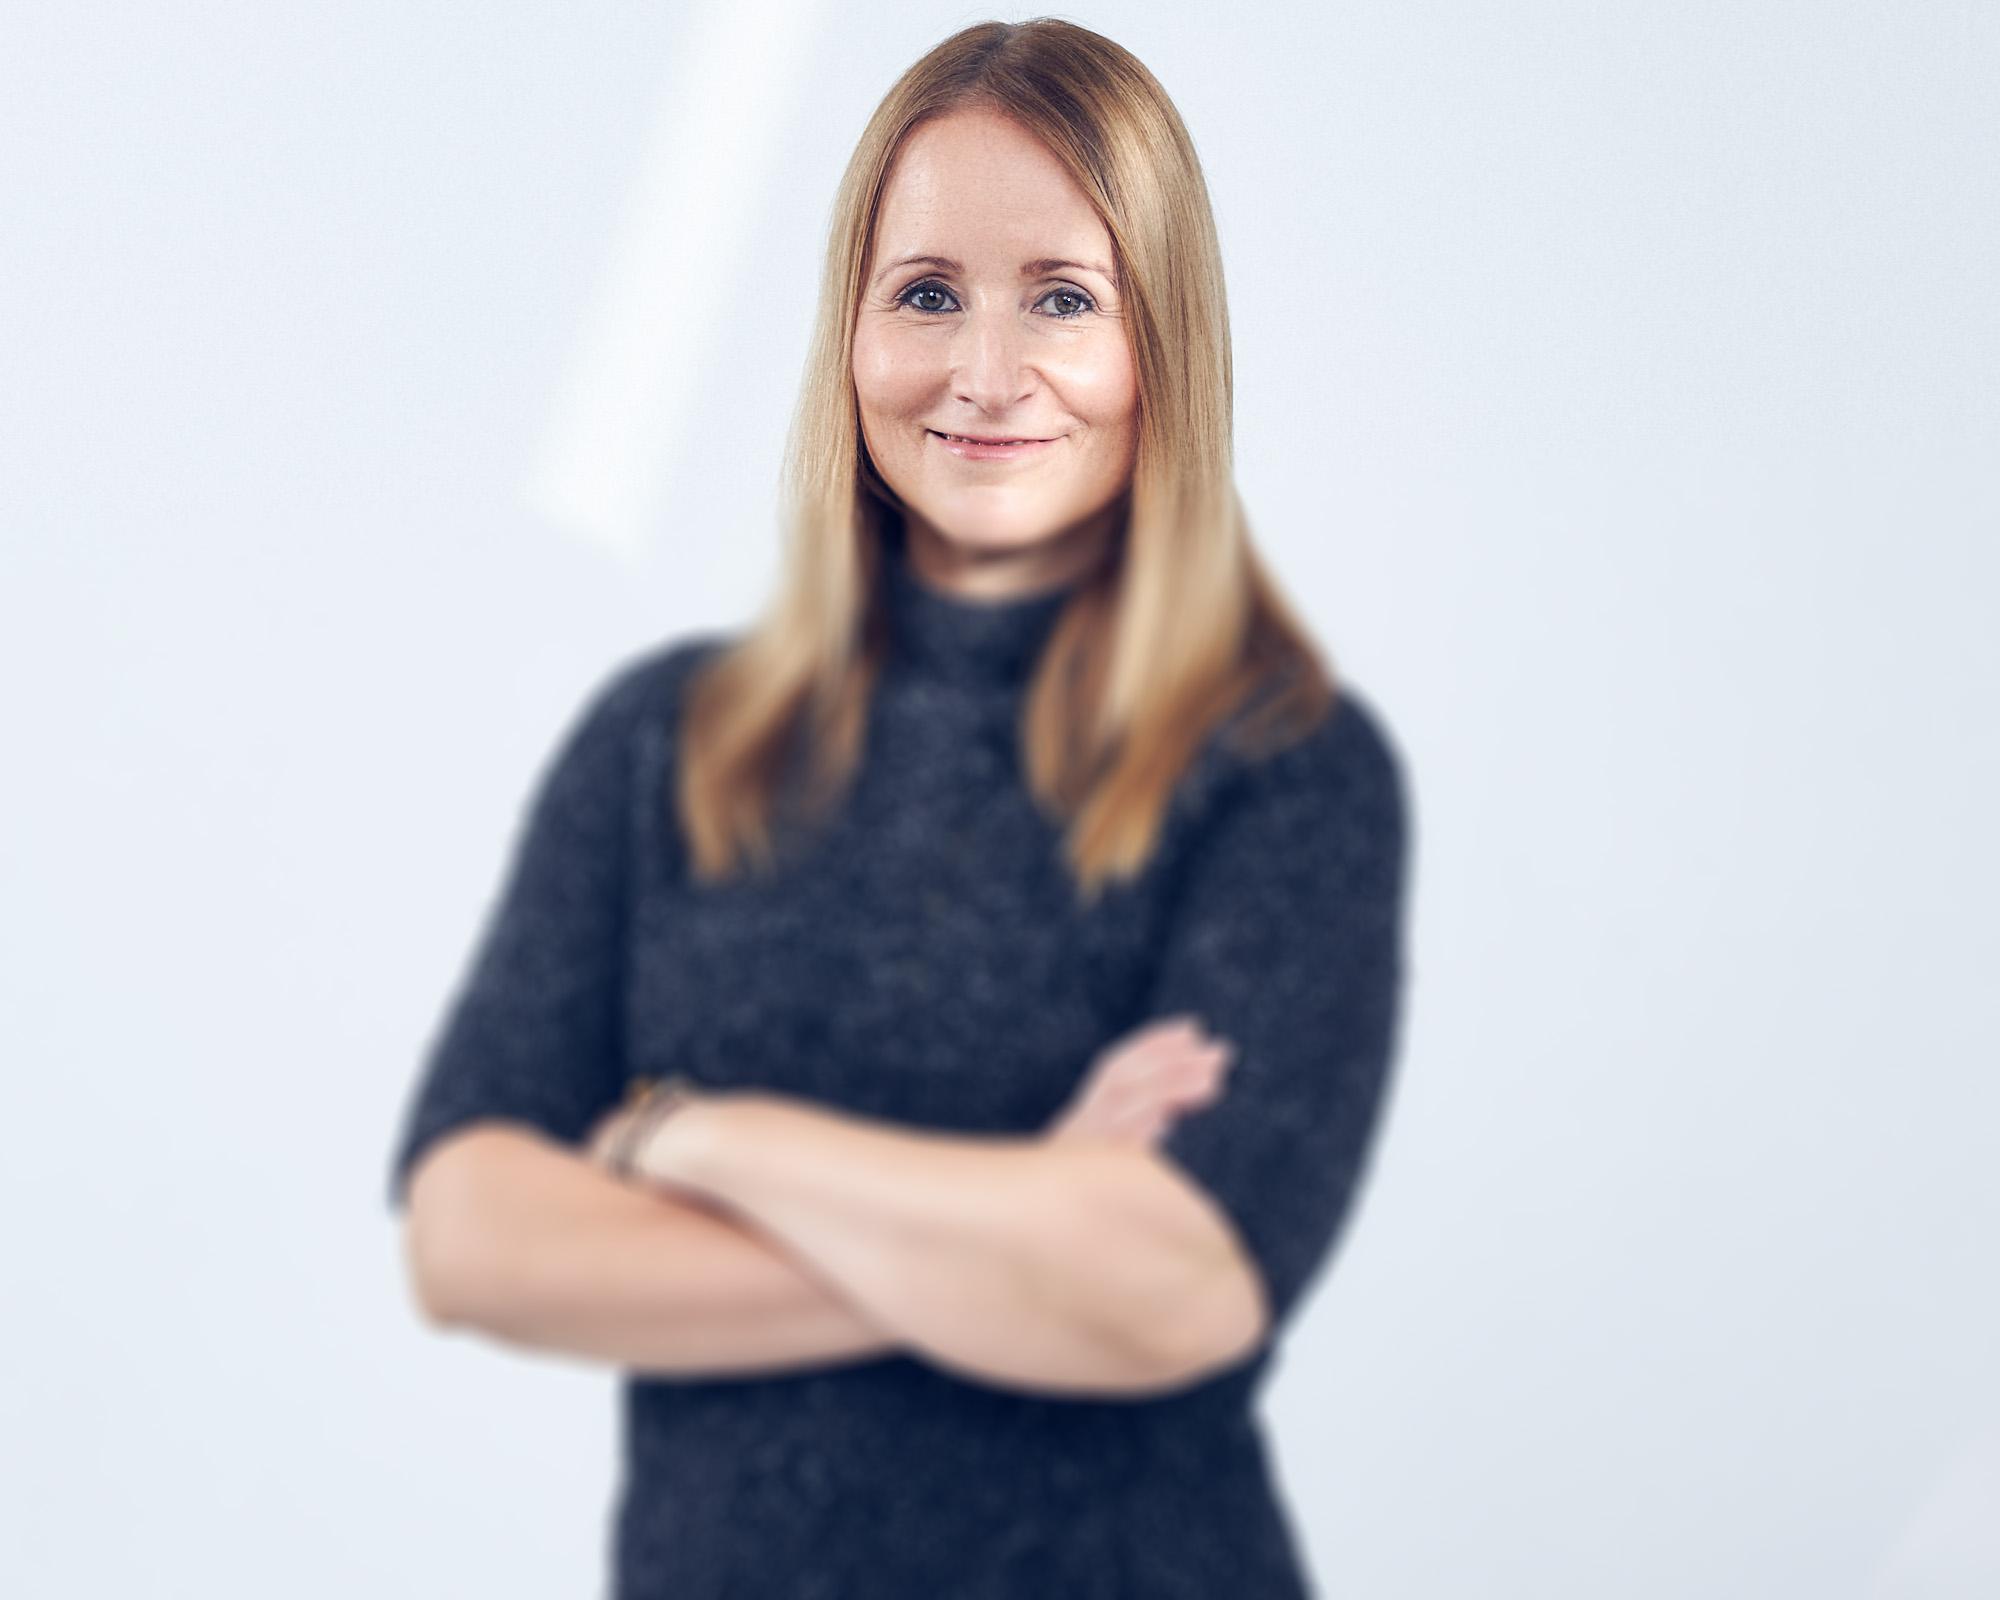 Hanna Seppänen